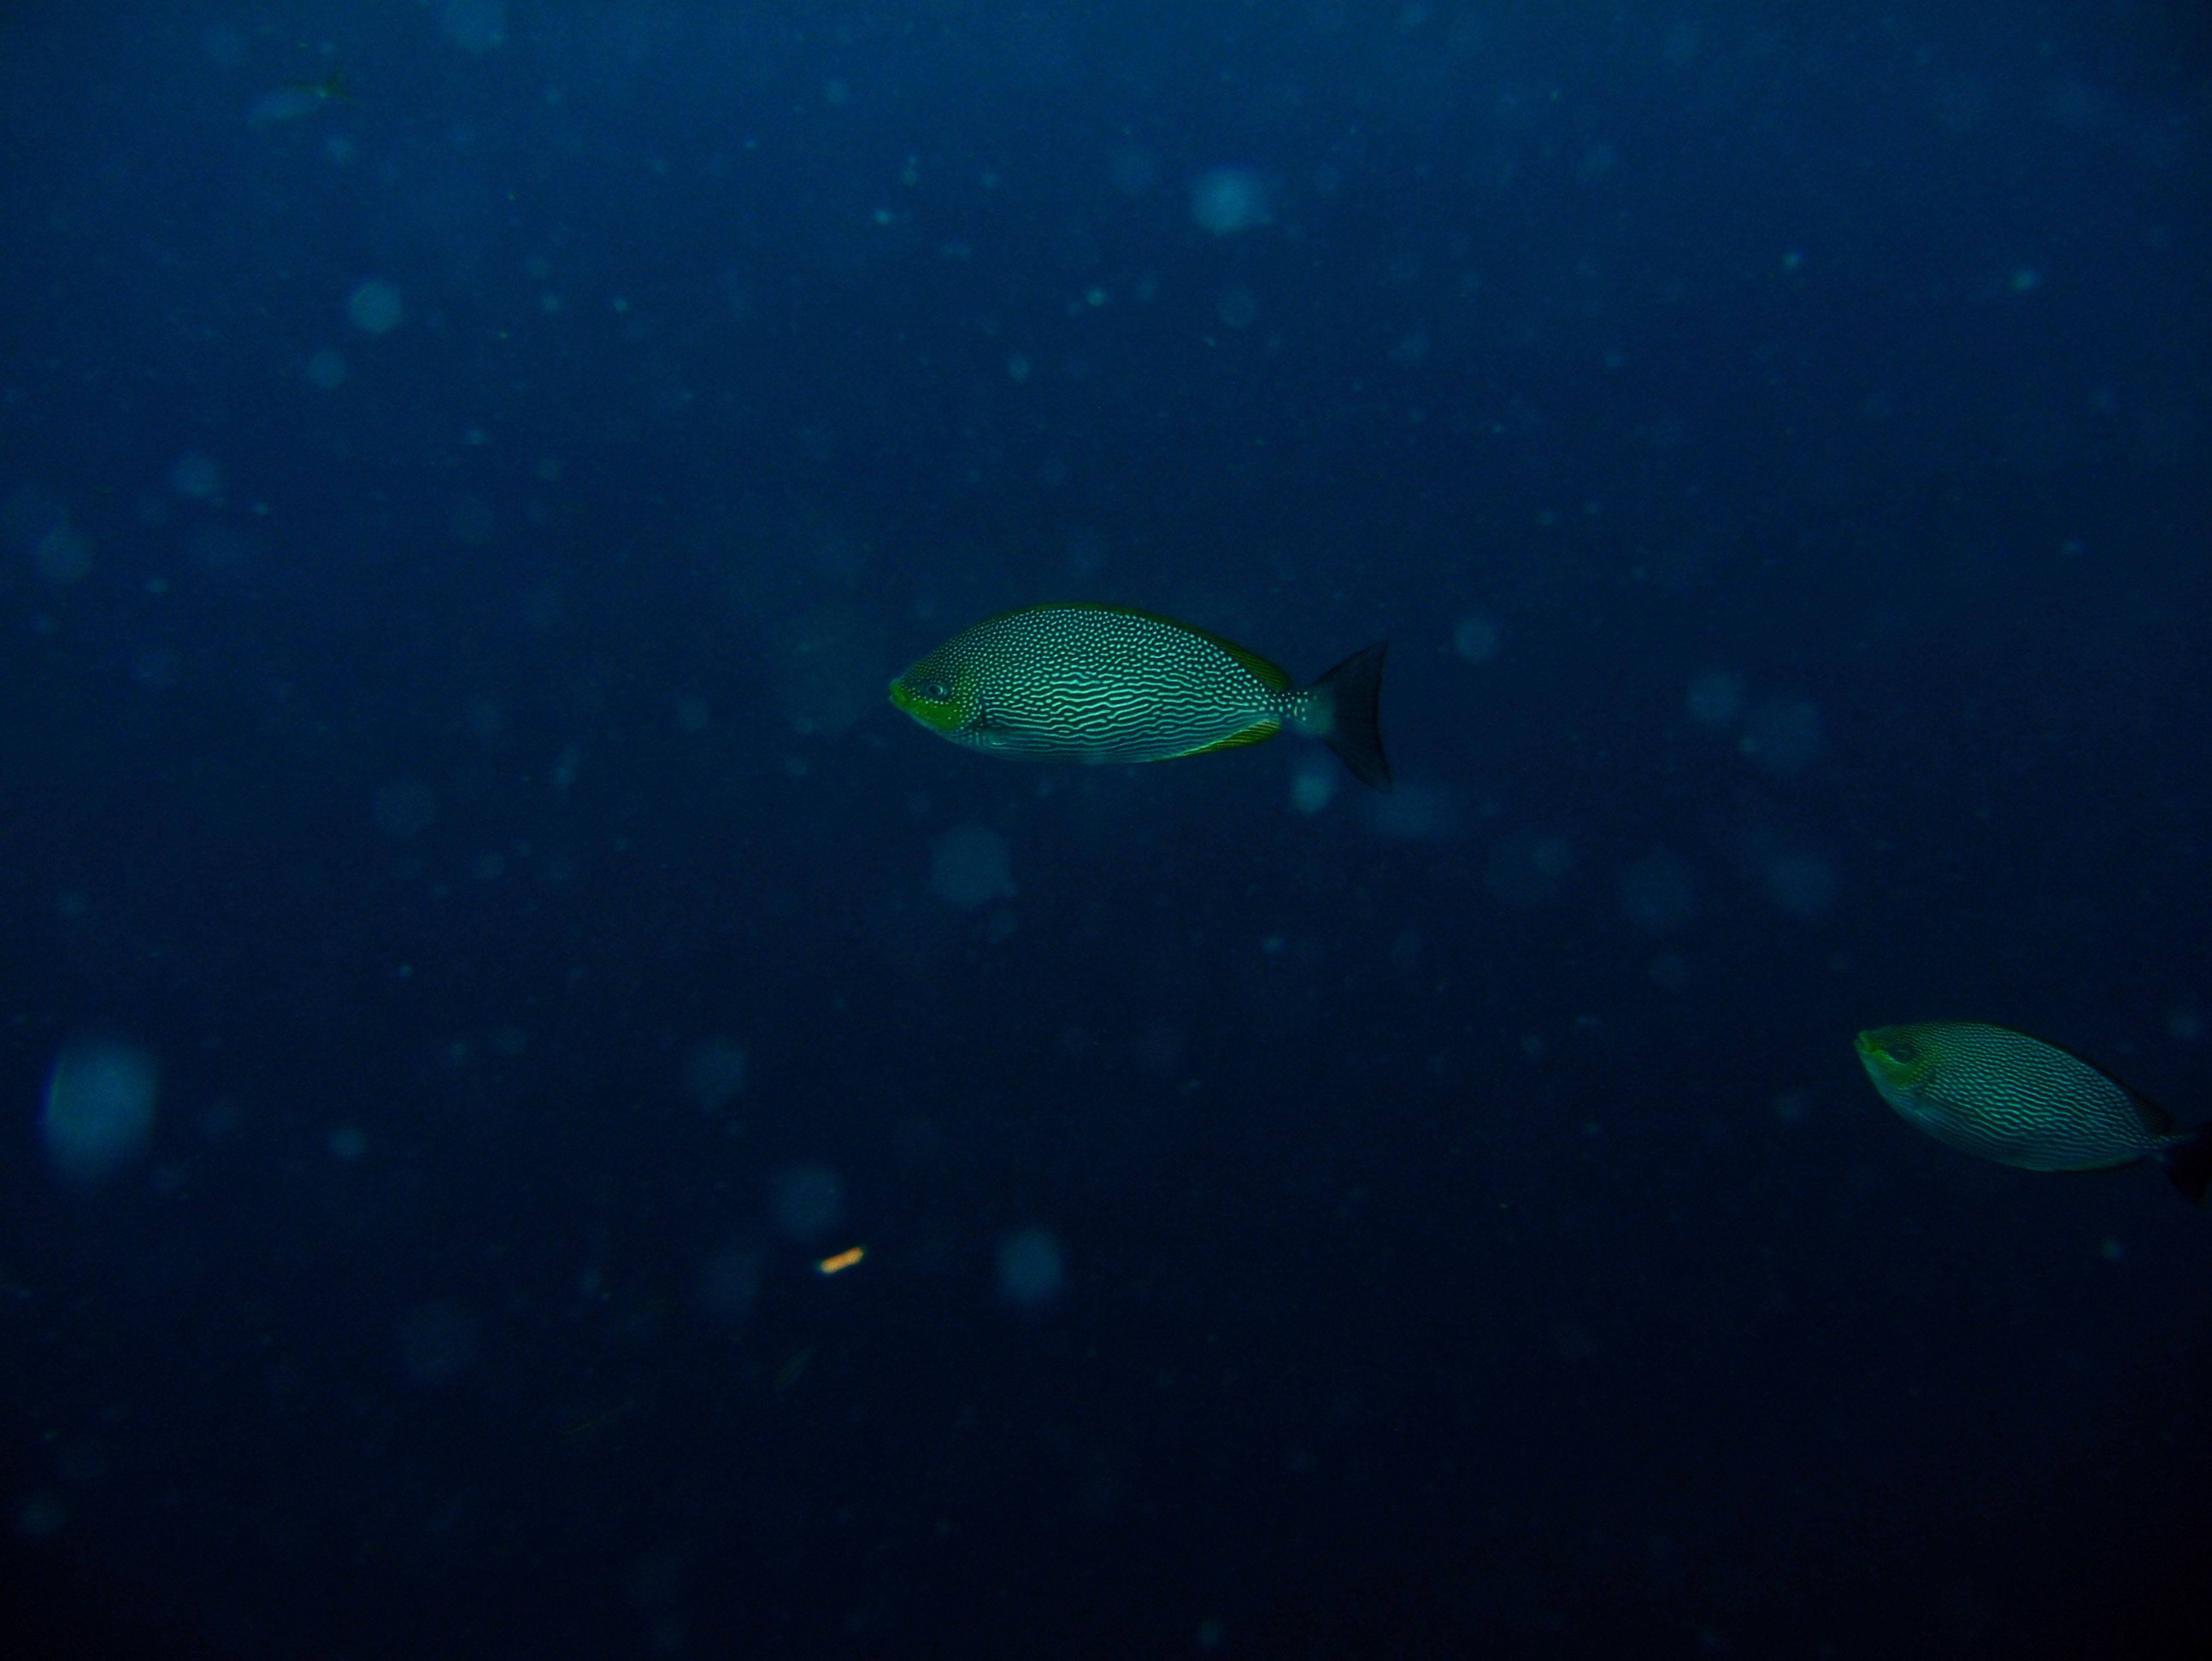 Coron dive site 8 Wreck dive IJN Olympia Maru July 2005 26